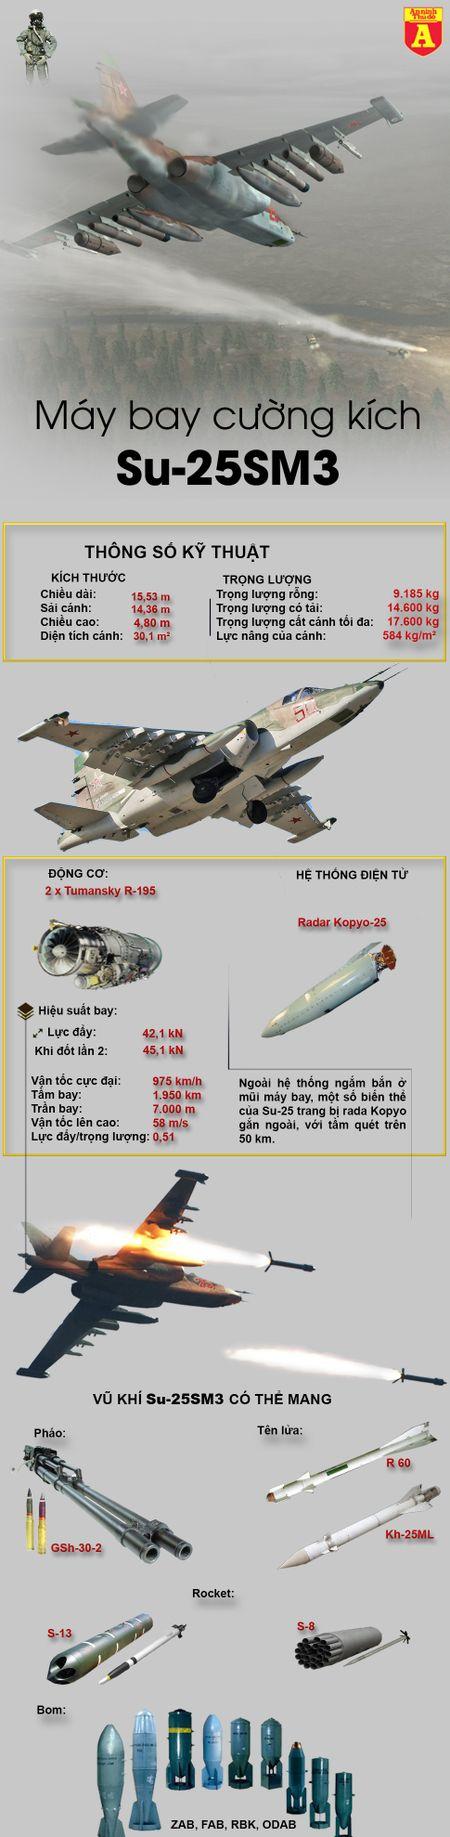 Noi danh tai Syria khien Nga quyet dinh trang bi sat thu diet tang Su-25SM3 - Anh 2